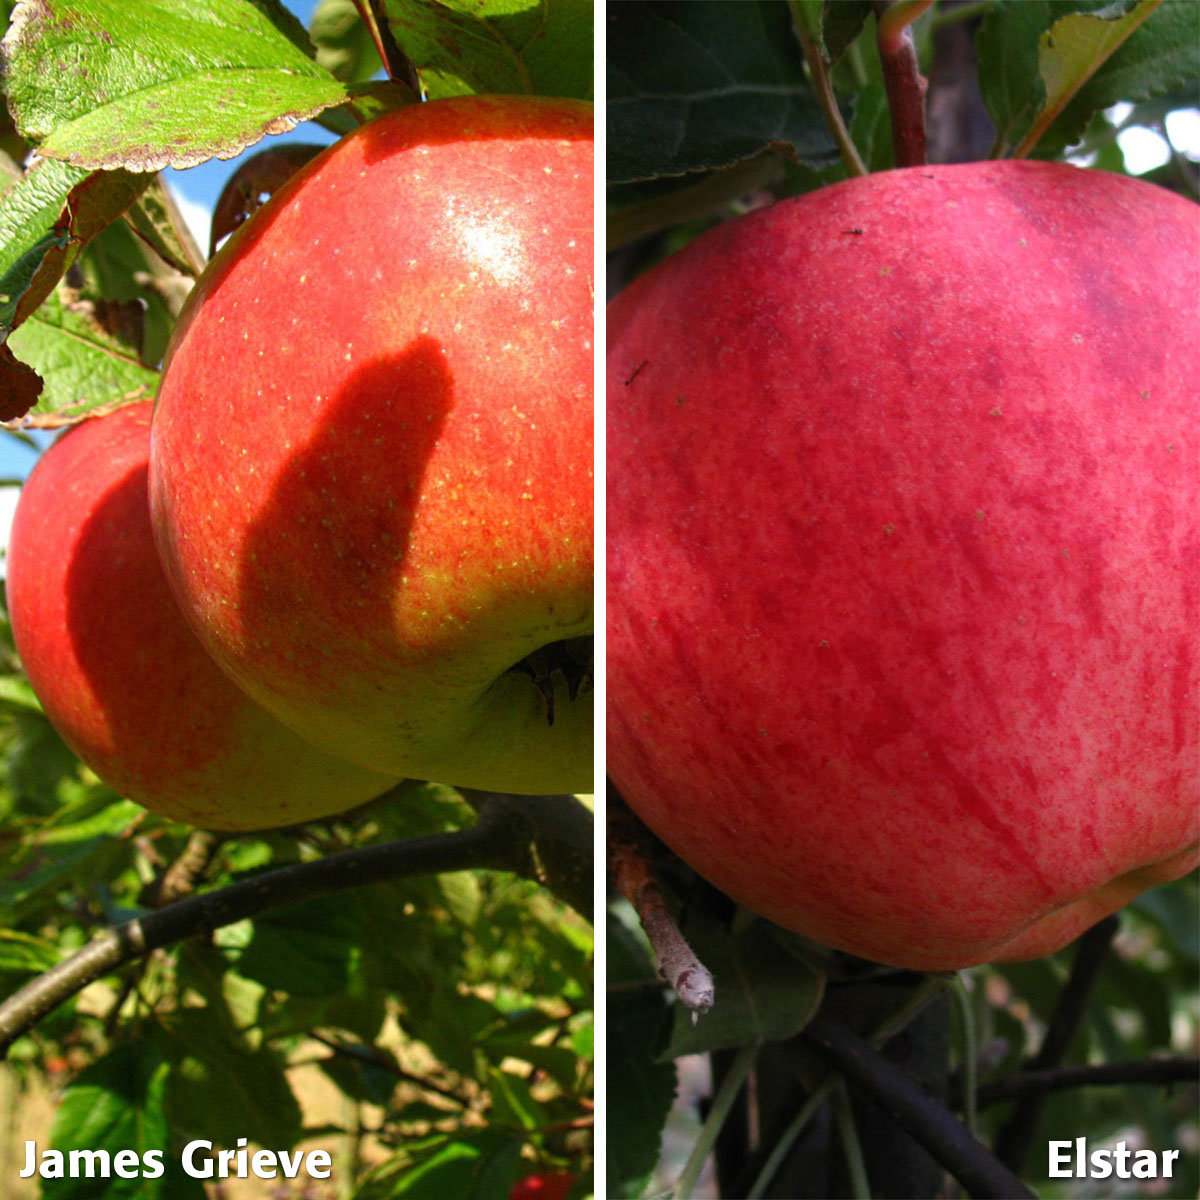 Duo-Apfel James Grieve - Elstar, 2-jährig